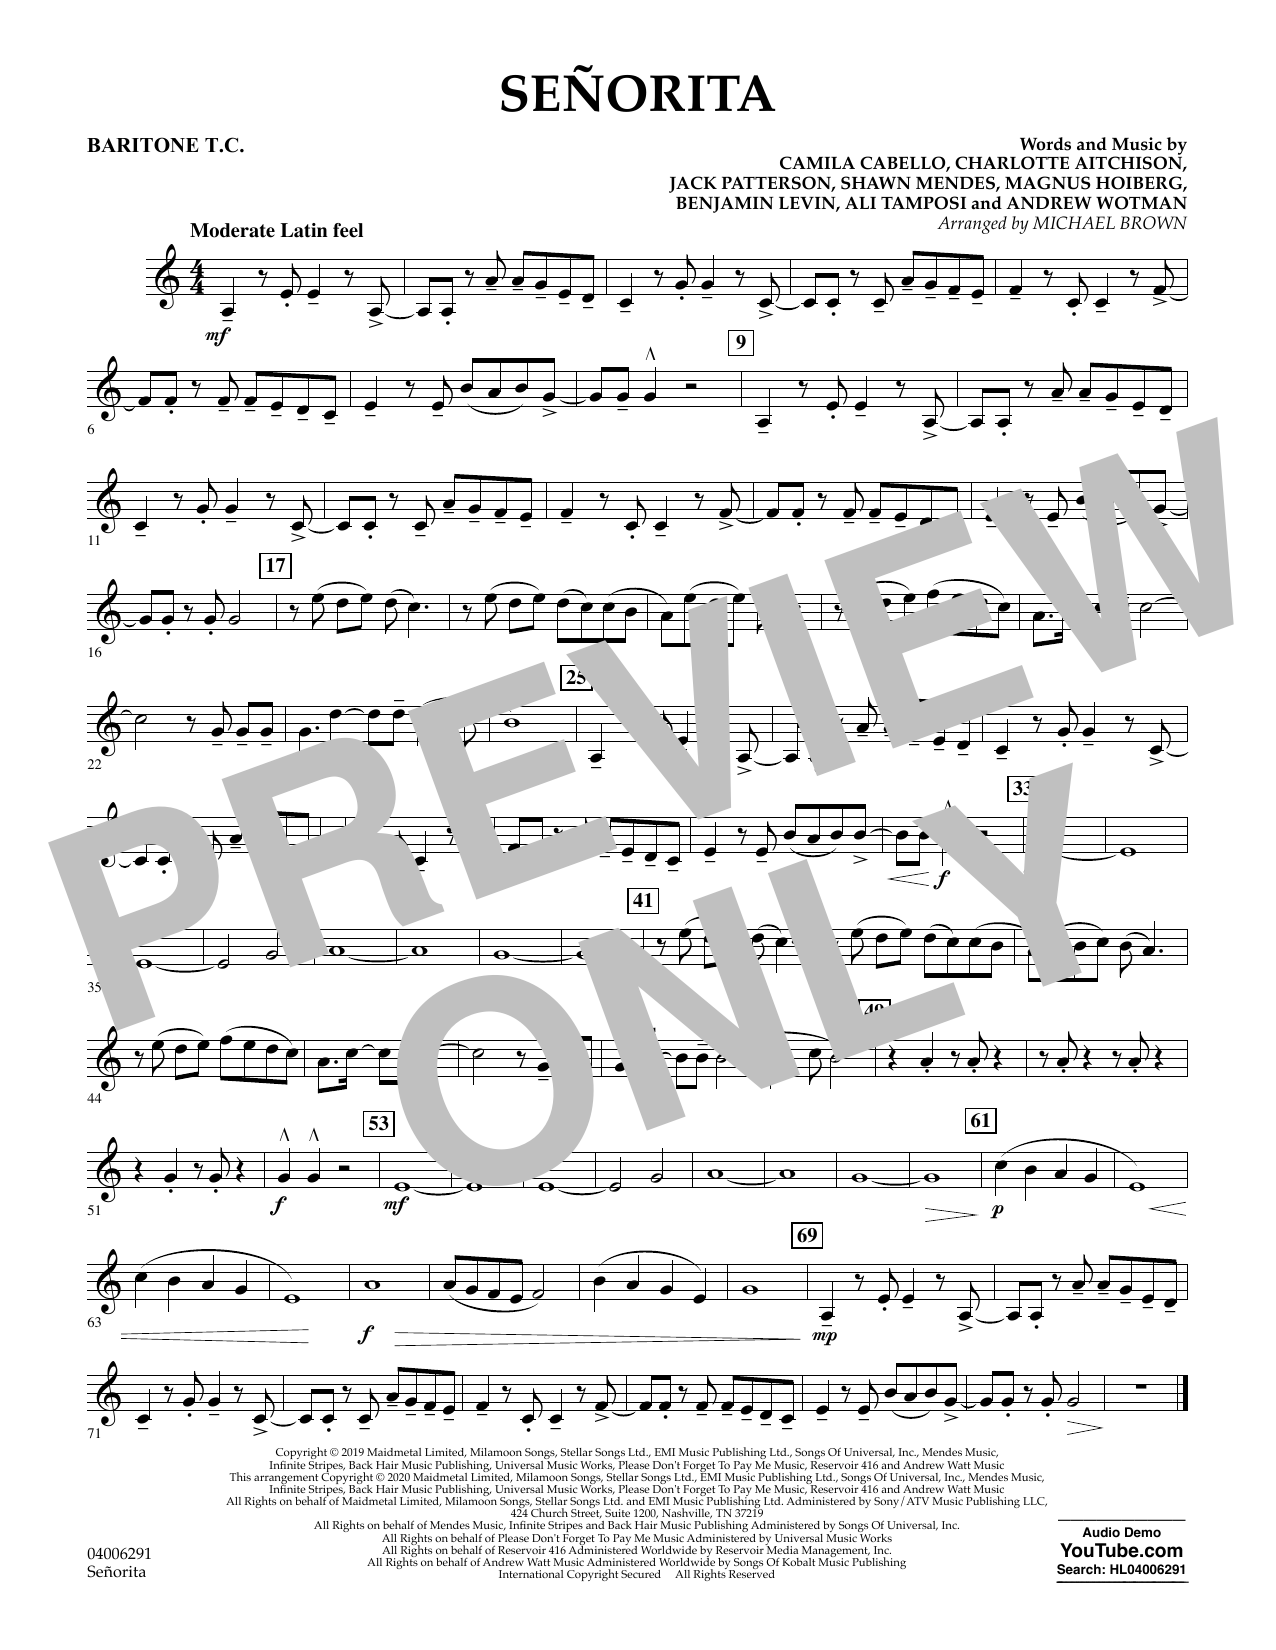 Señorita (arr. Michael Brown) - Baritone T.C. (Concert Band)